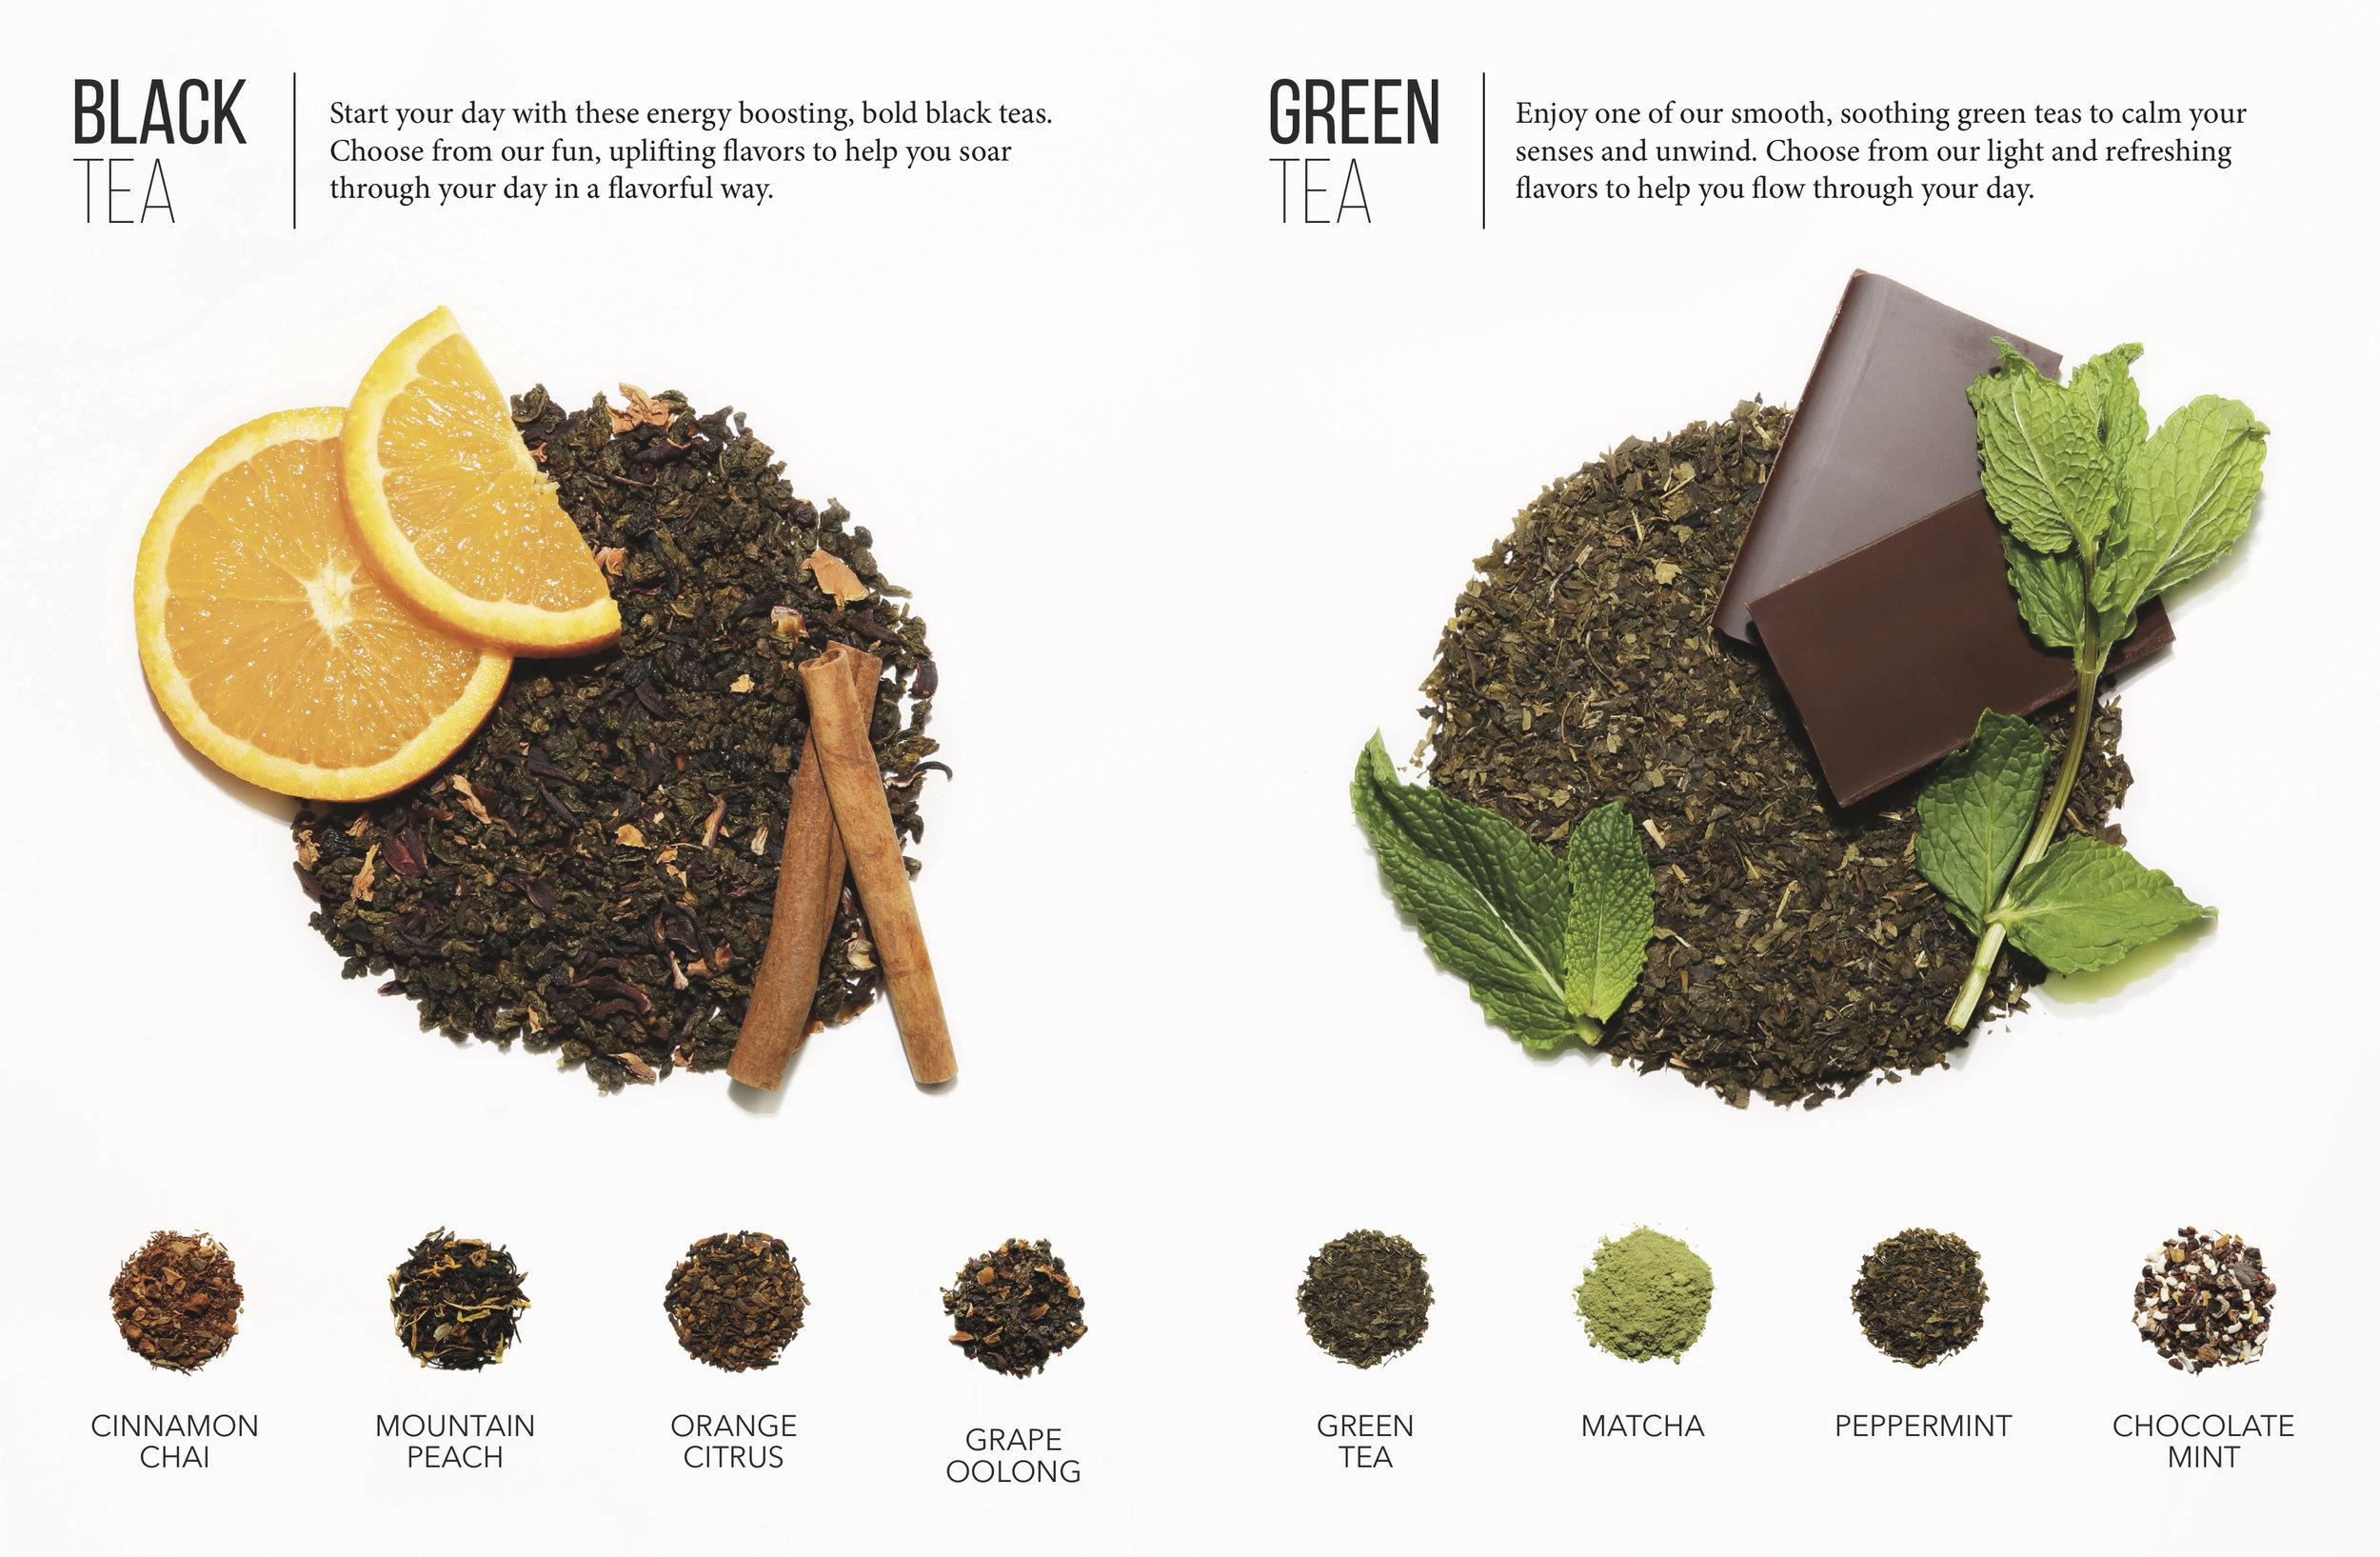 Tea_Catalog 4.jpg